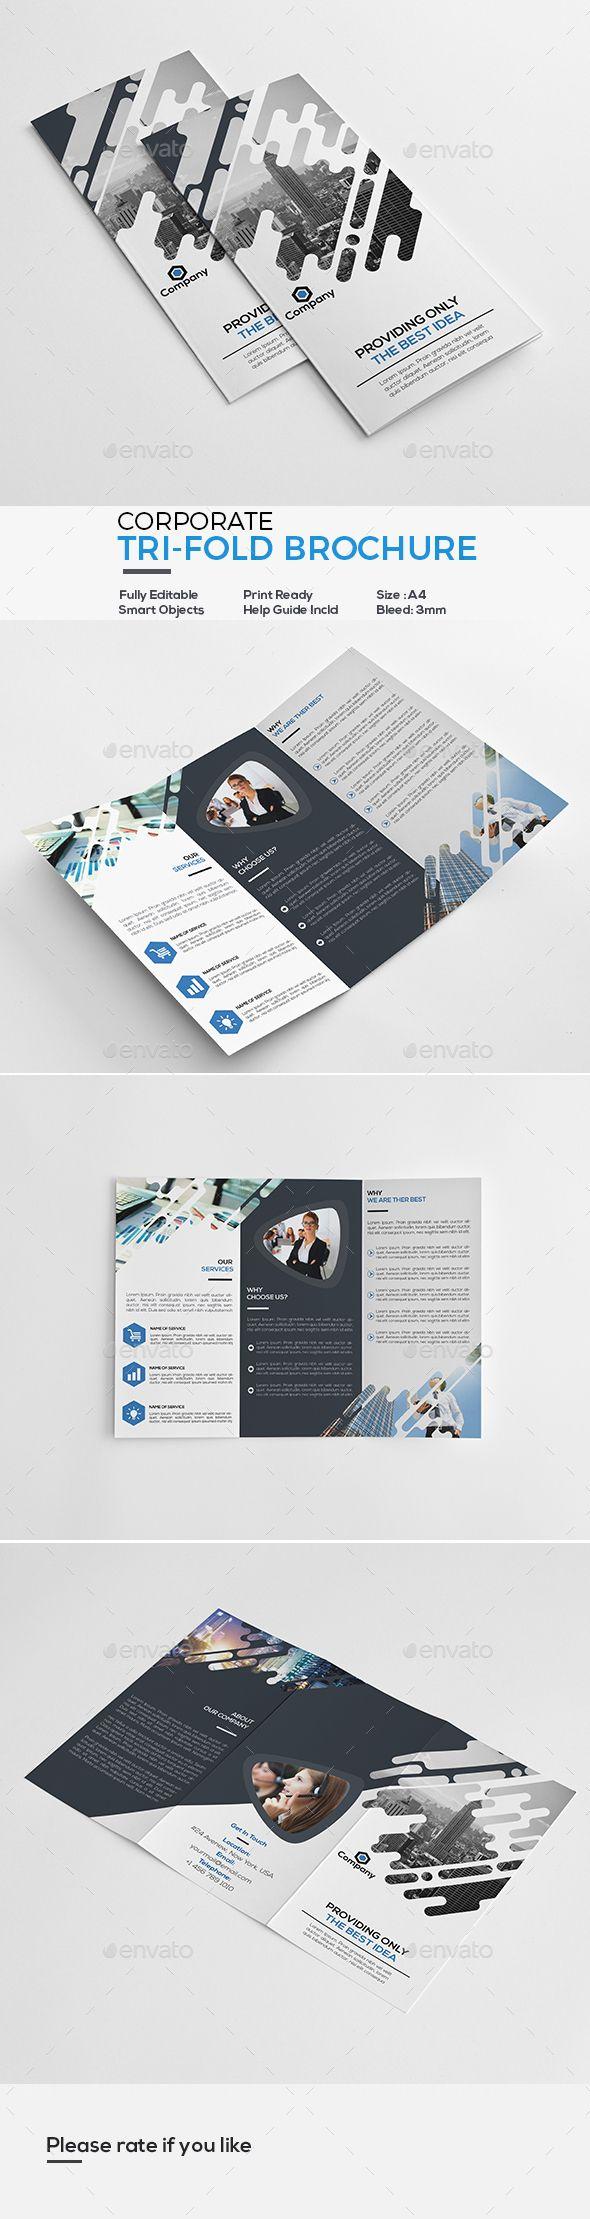 corporate tri fold brochure template psd design download